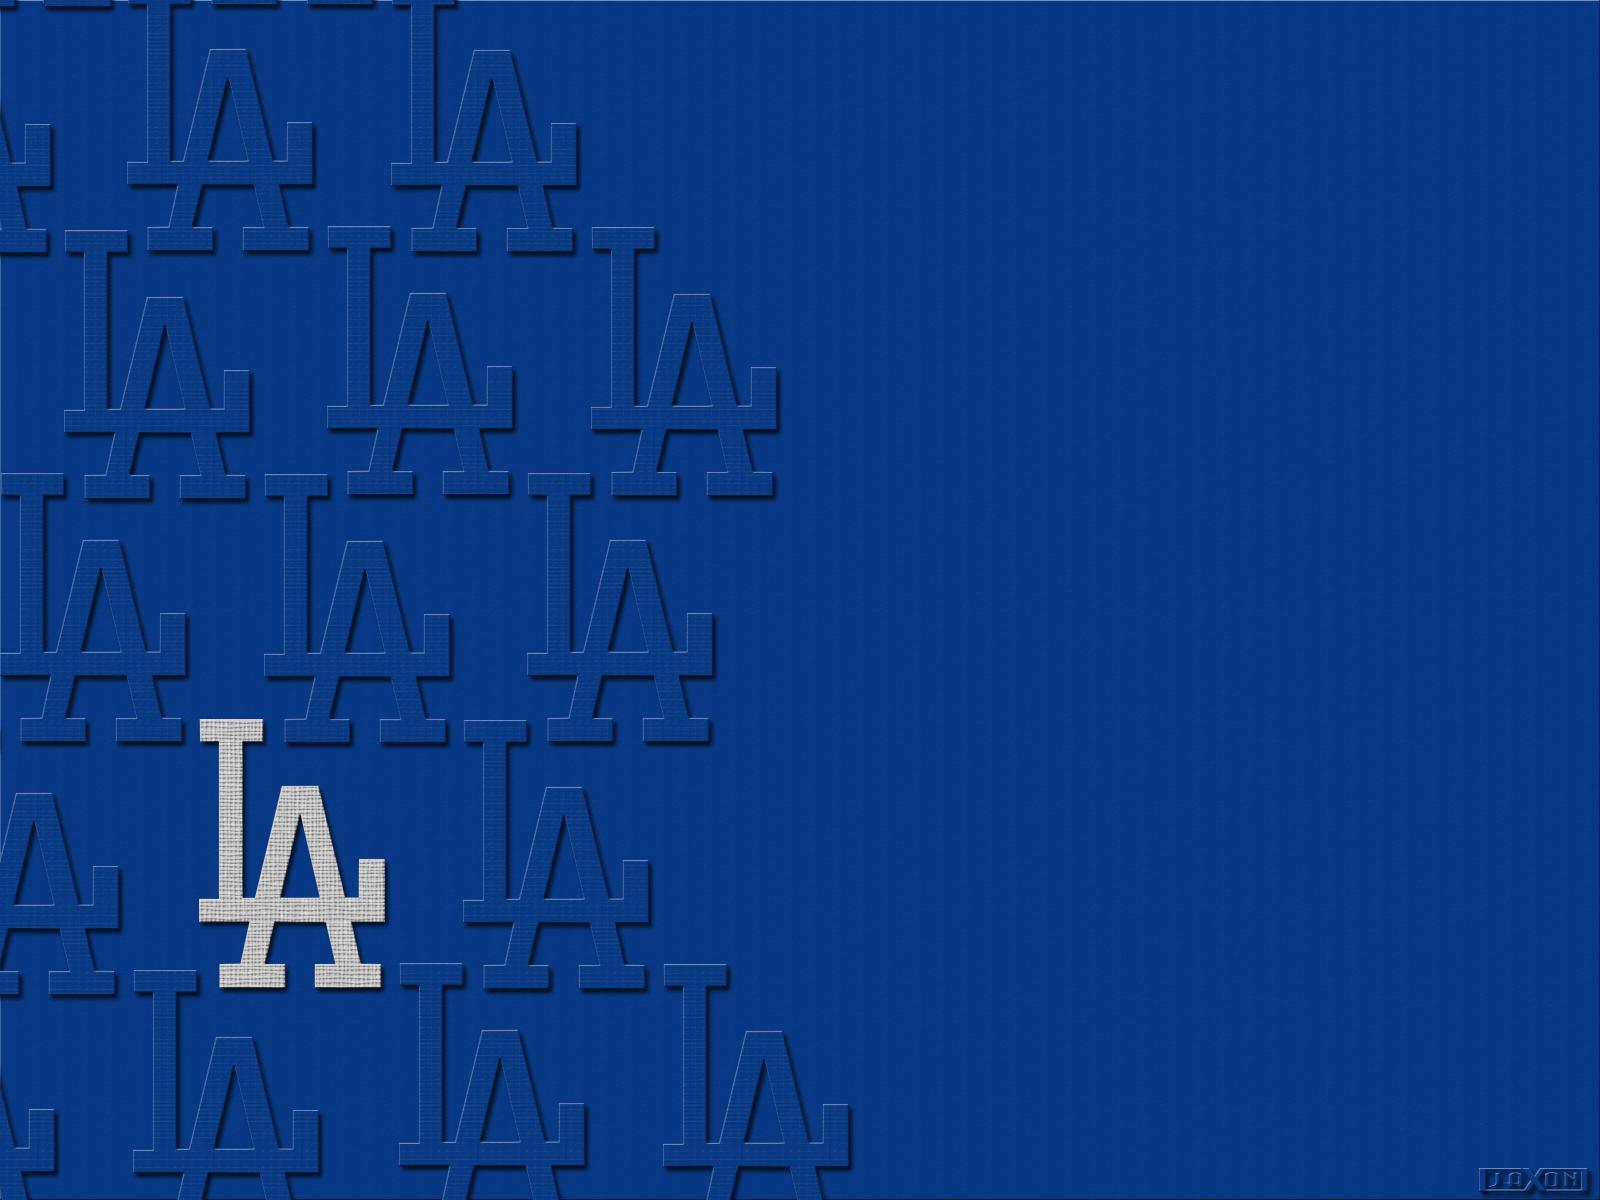 Free Download Los Angeles Dodgers Baseball Mlb D Wallpaper 1600x1200 158567 1600x1200 For Your Desktop Mobile Tablet Explore 20 Los Angeles Dodgers Baseball Wallpapers Los Angeles Dodgers Baseball Wallpapers